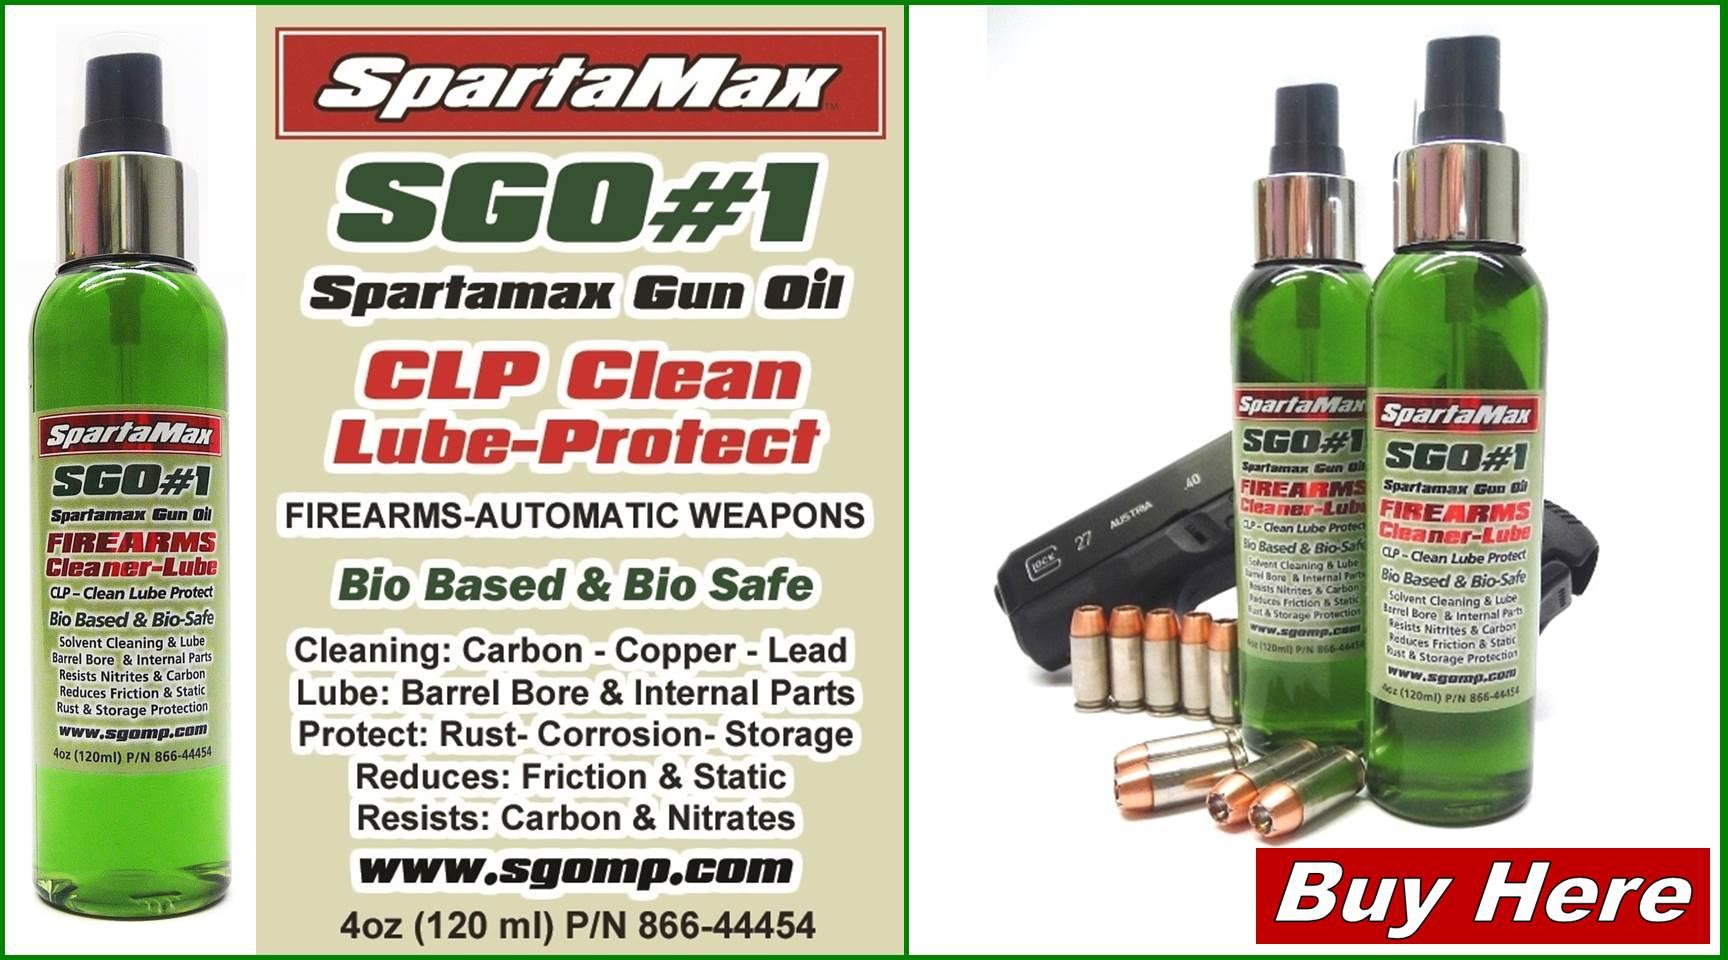 SpartaMax Products - SpartaMax Gun Oil Store & TechData